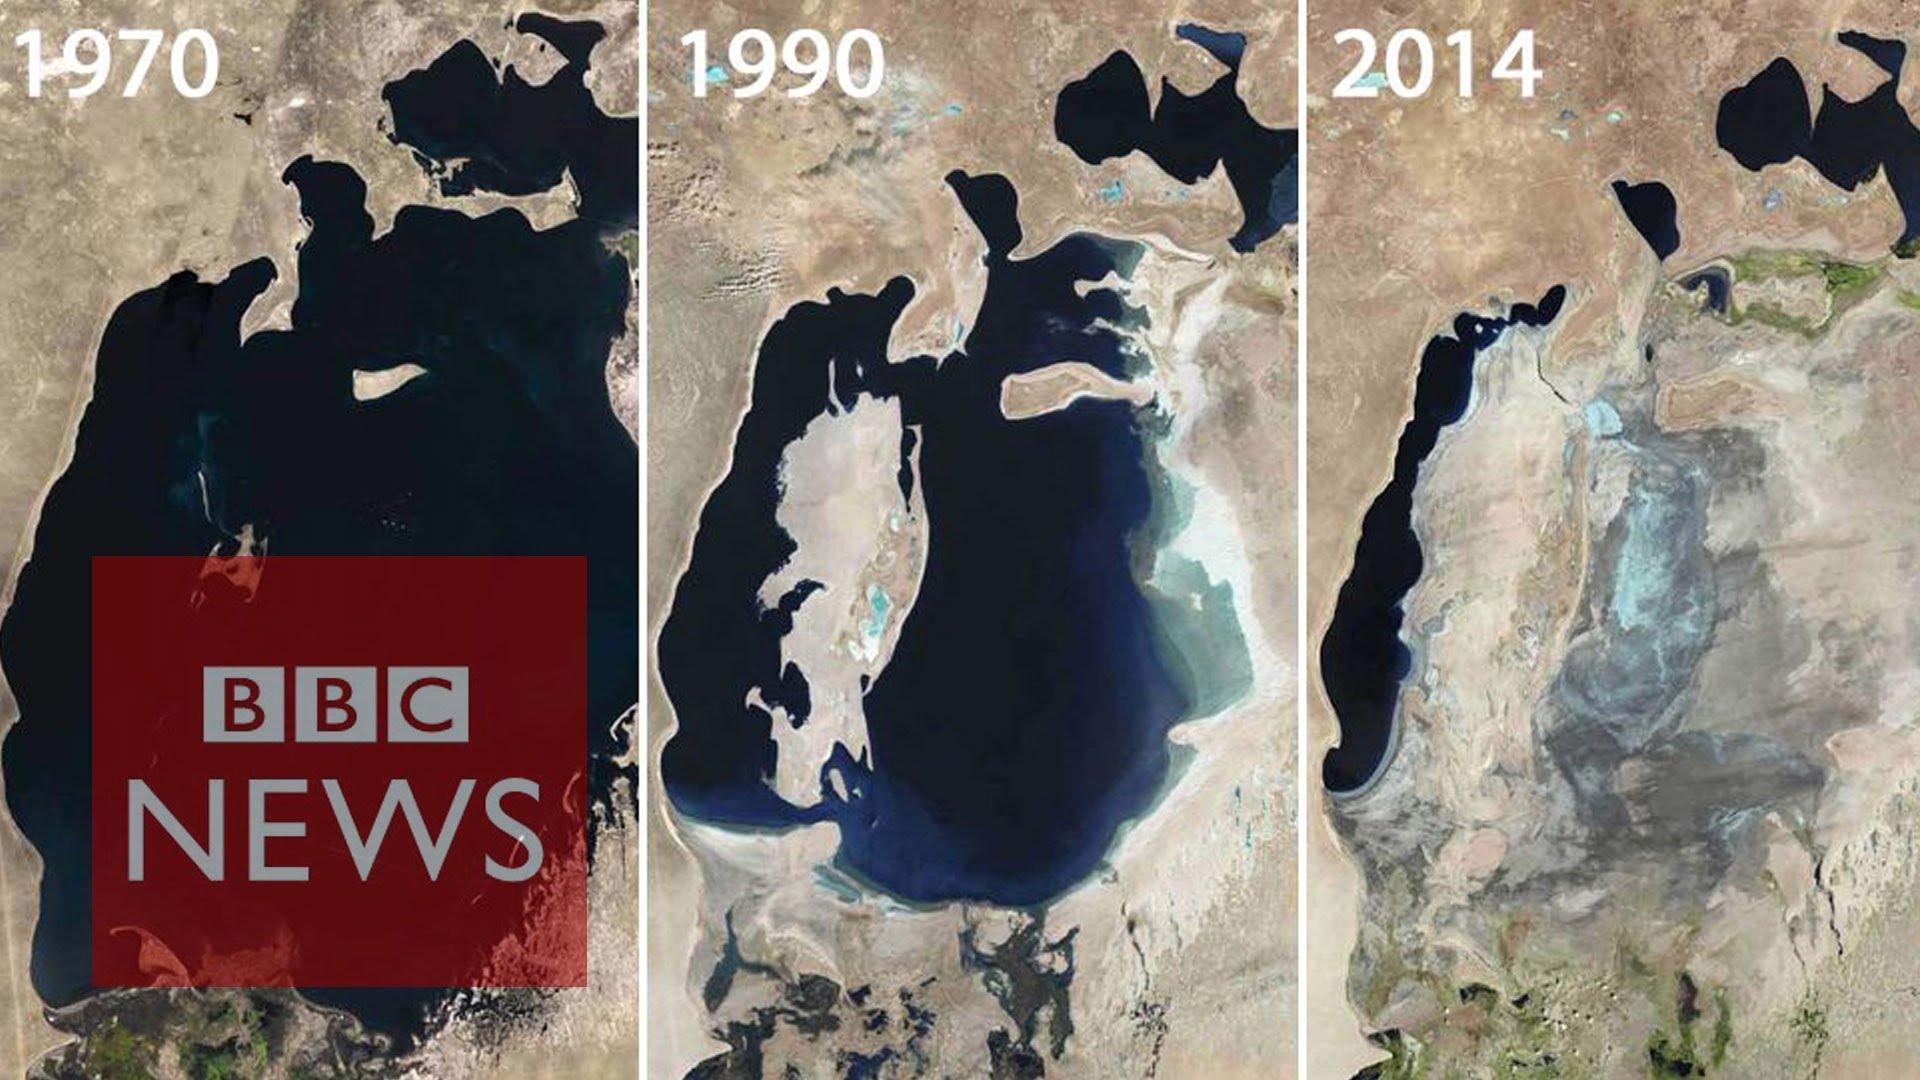 Cute Country Wallpaper Aral Sea Wallpaper 1920x1080 82076